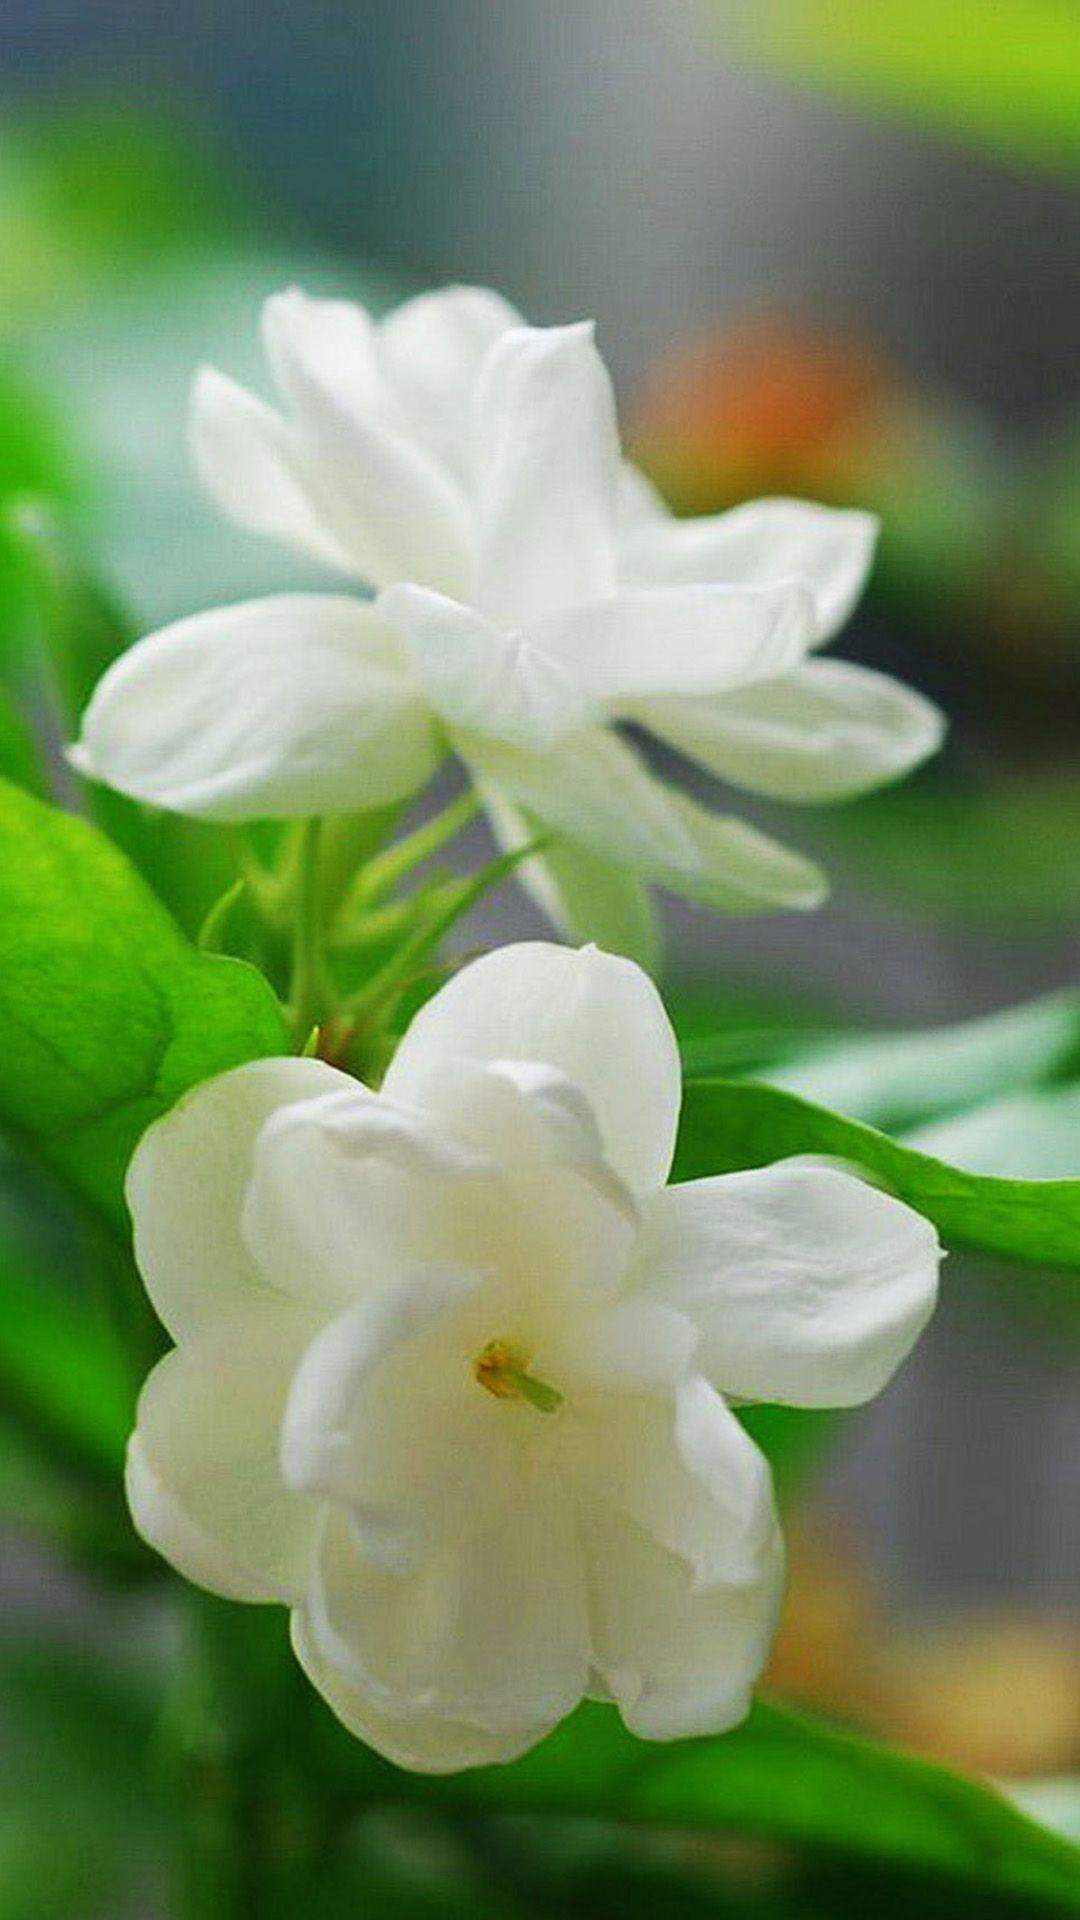 Jasmine Flower Macro Iphone 6 Plus Wallpaper Iphone 6